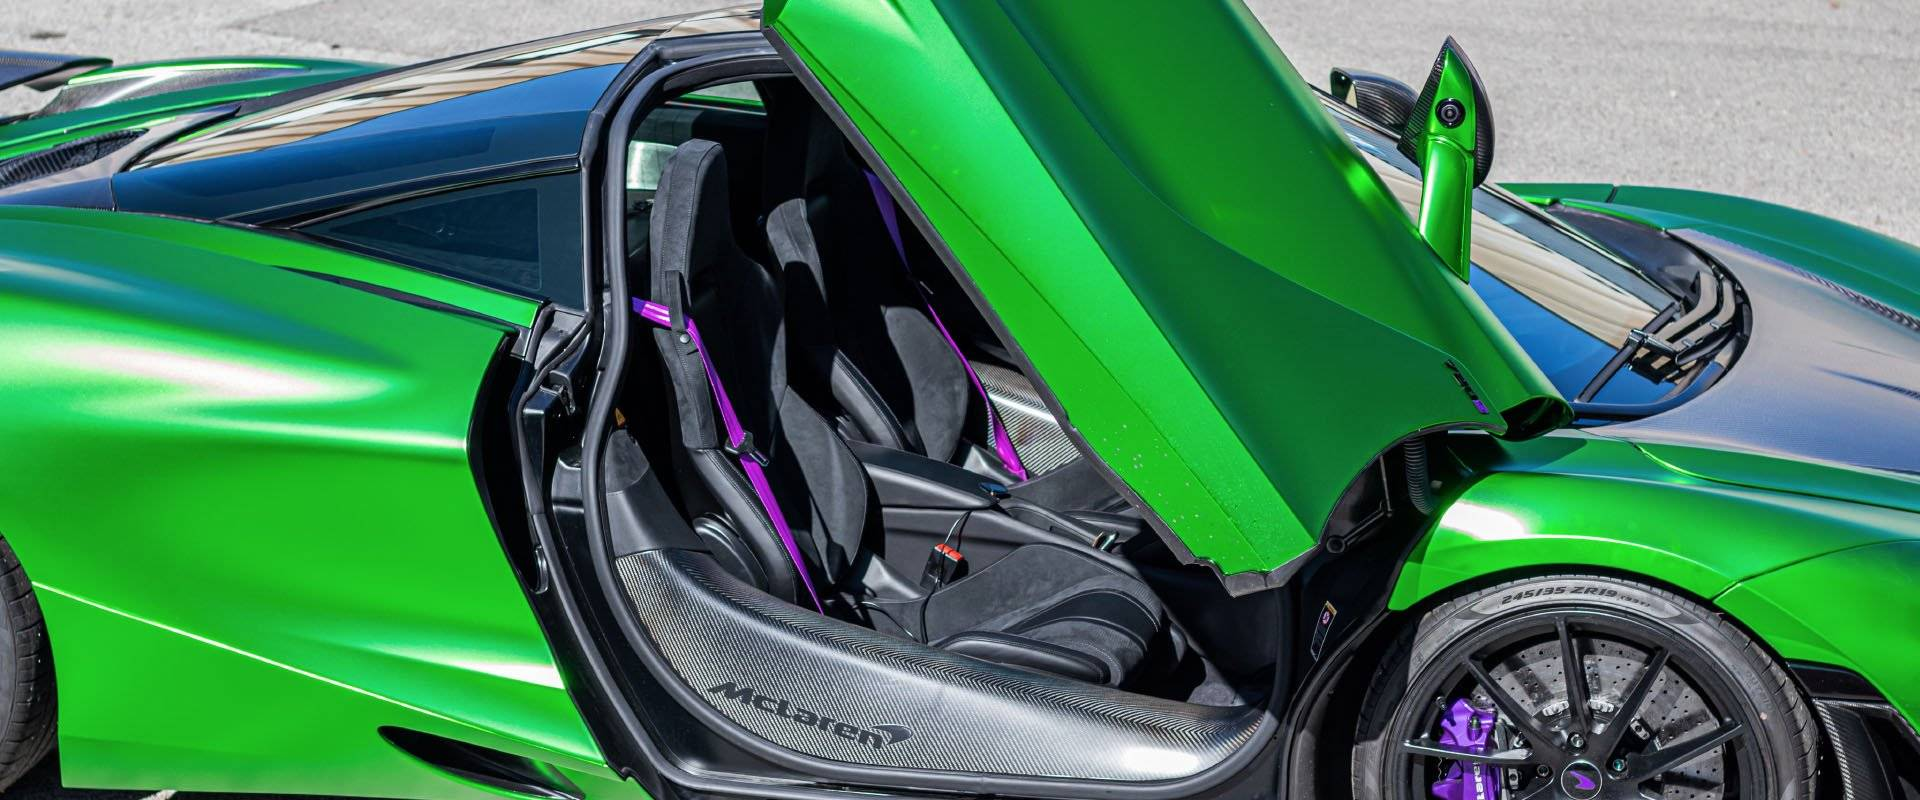 Custom Interior Installer for Exotics and Luxury Vehicles in Chicago